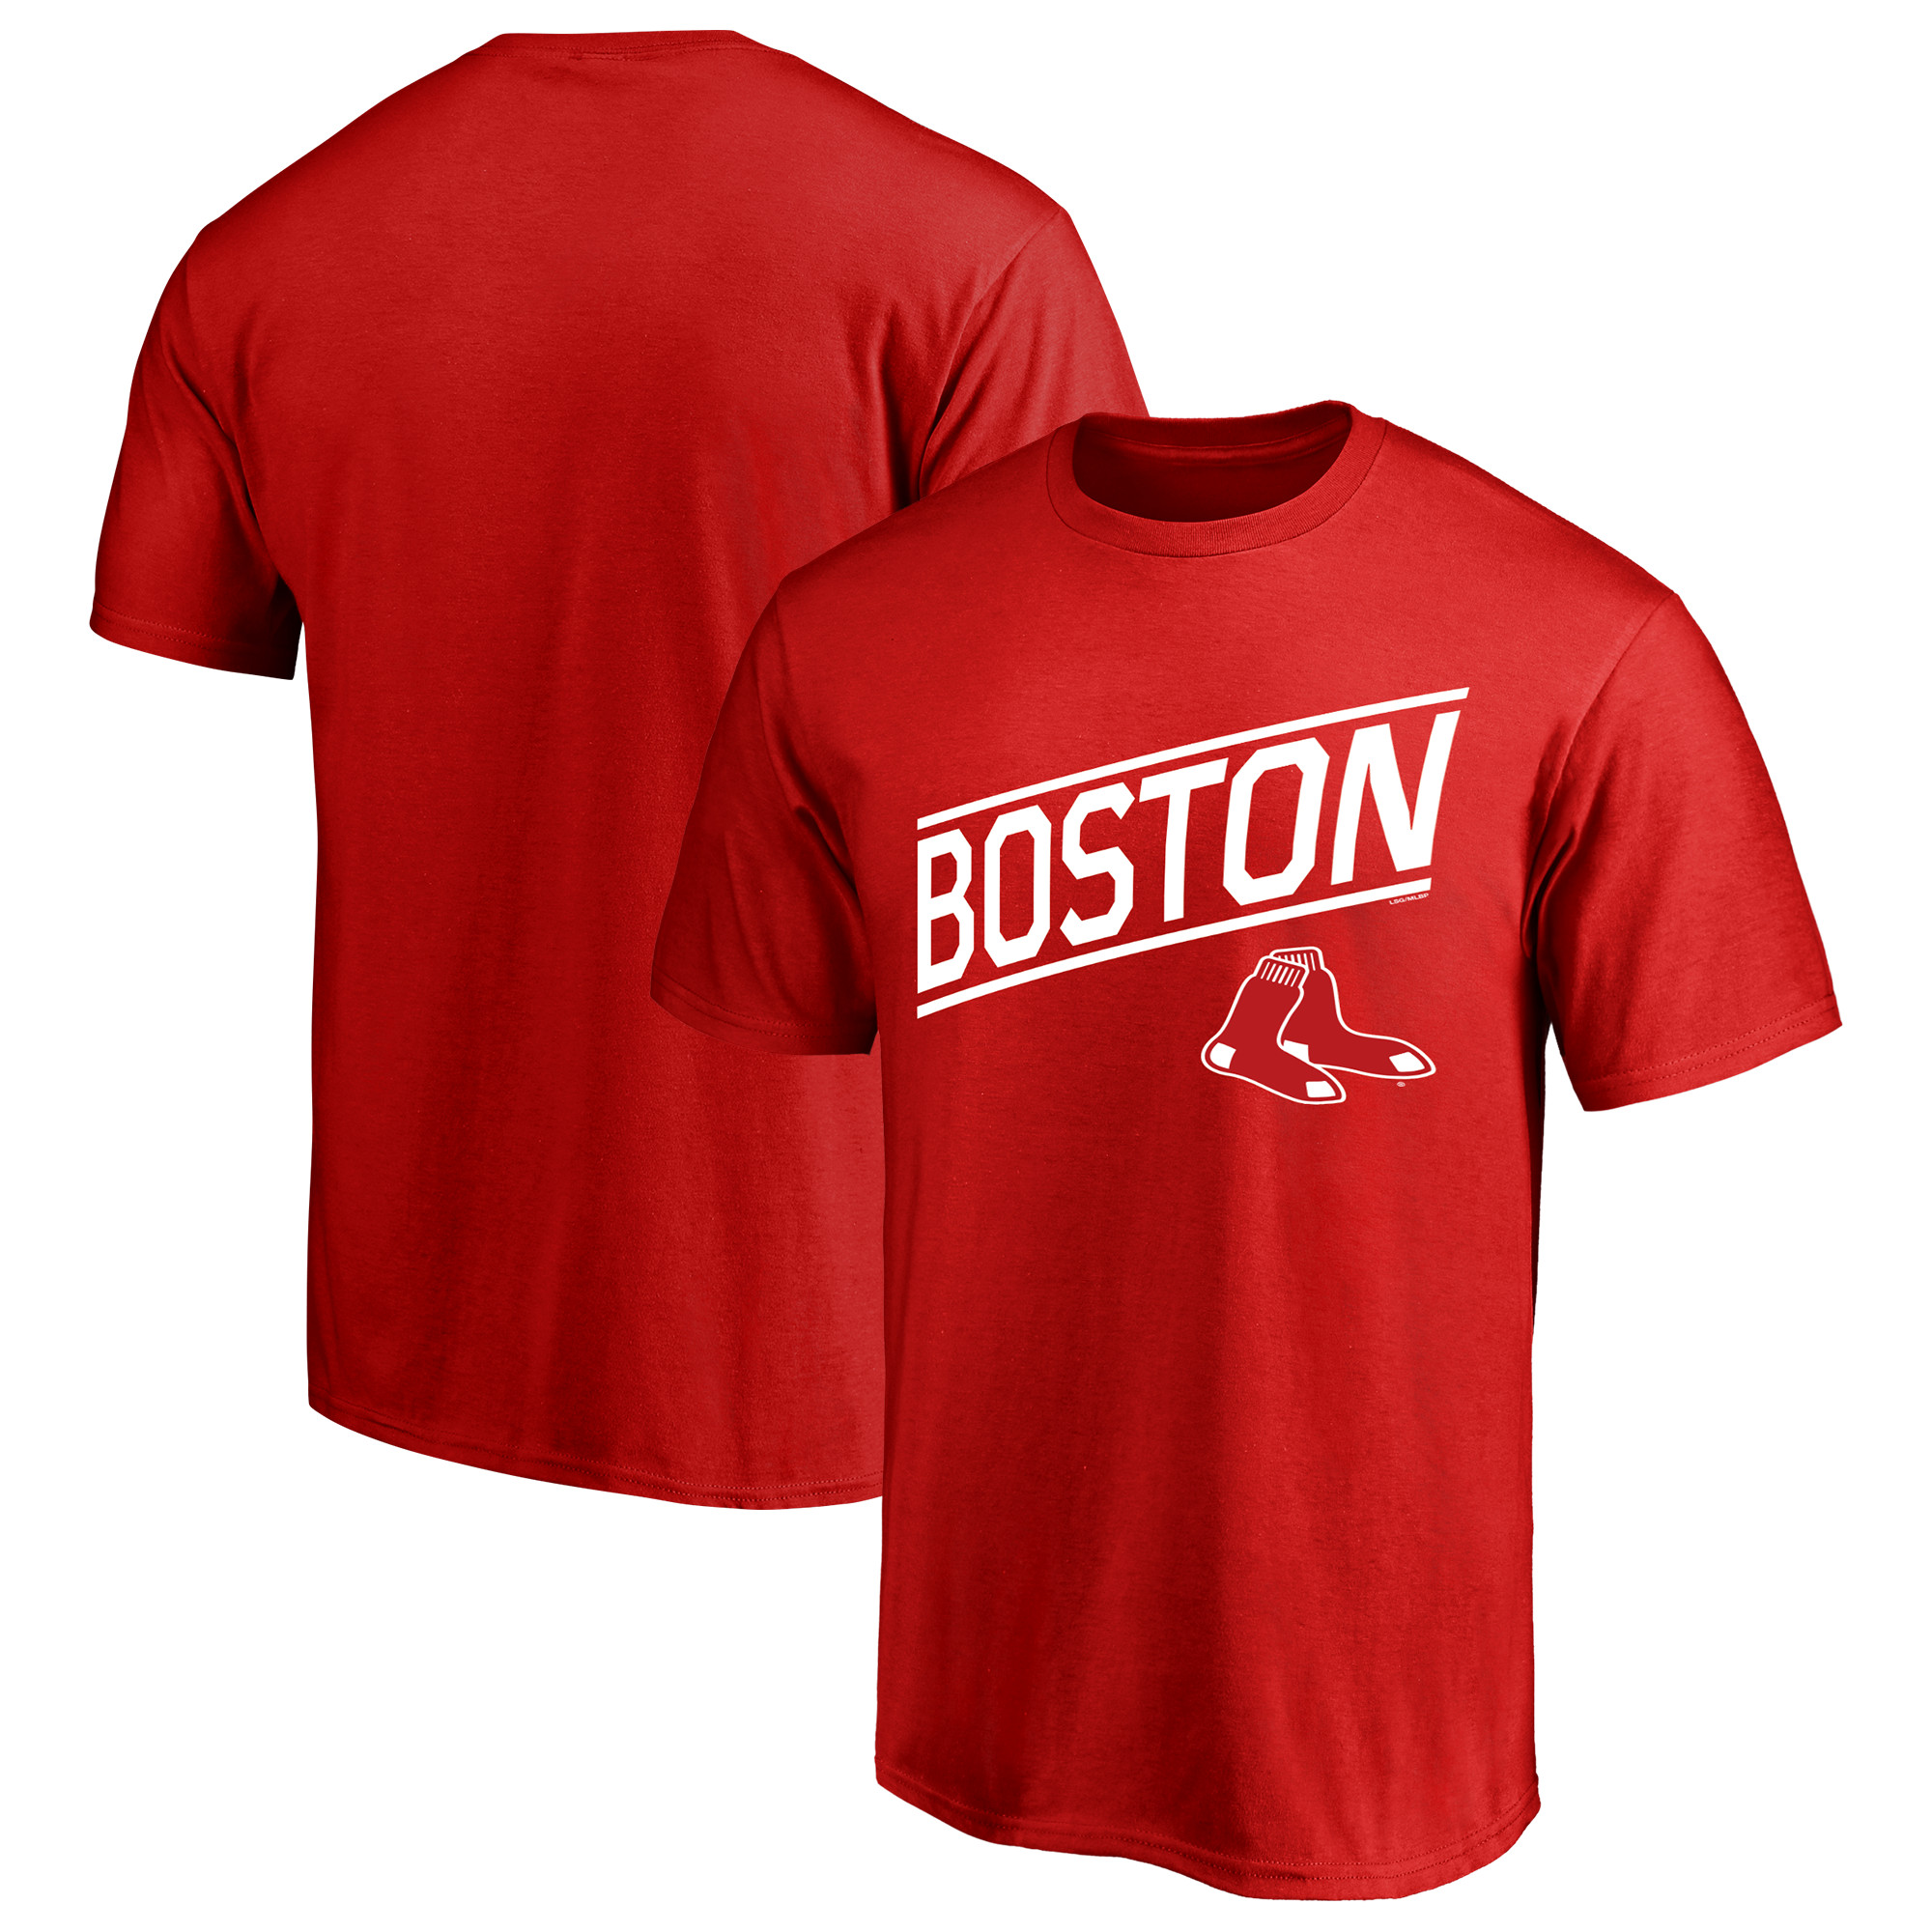 b41c01544f6 Boston Red Sox Team Shop - Walmart.com